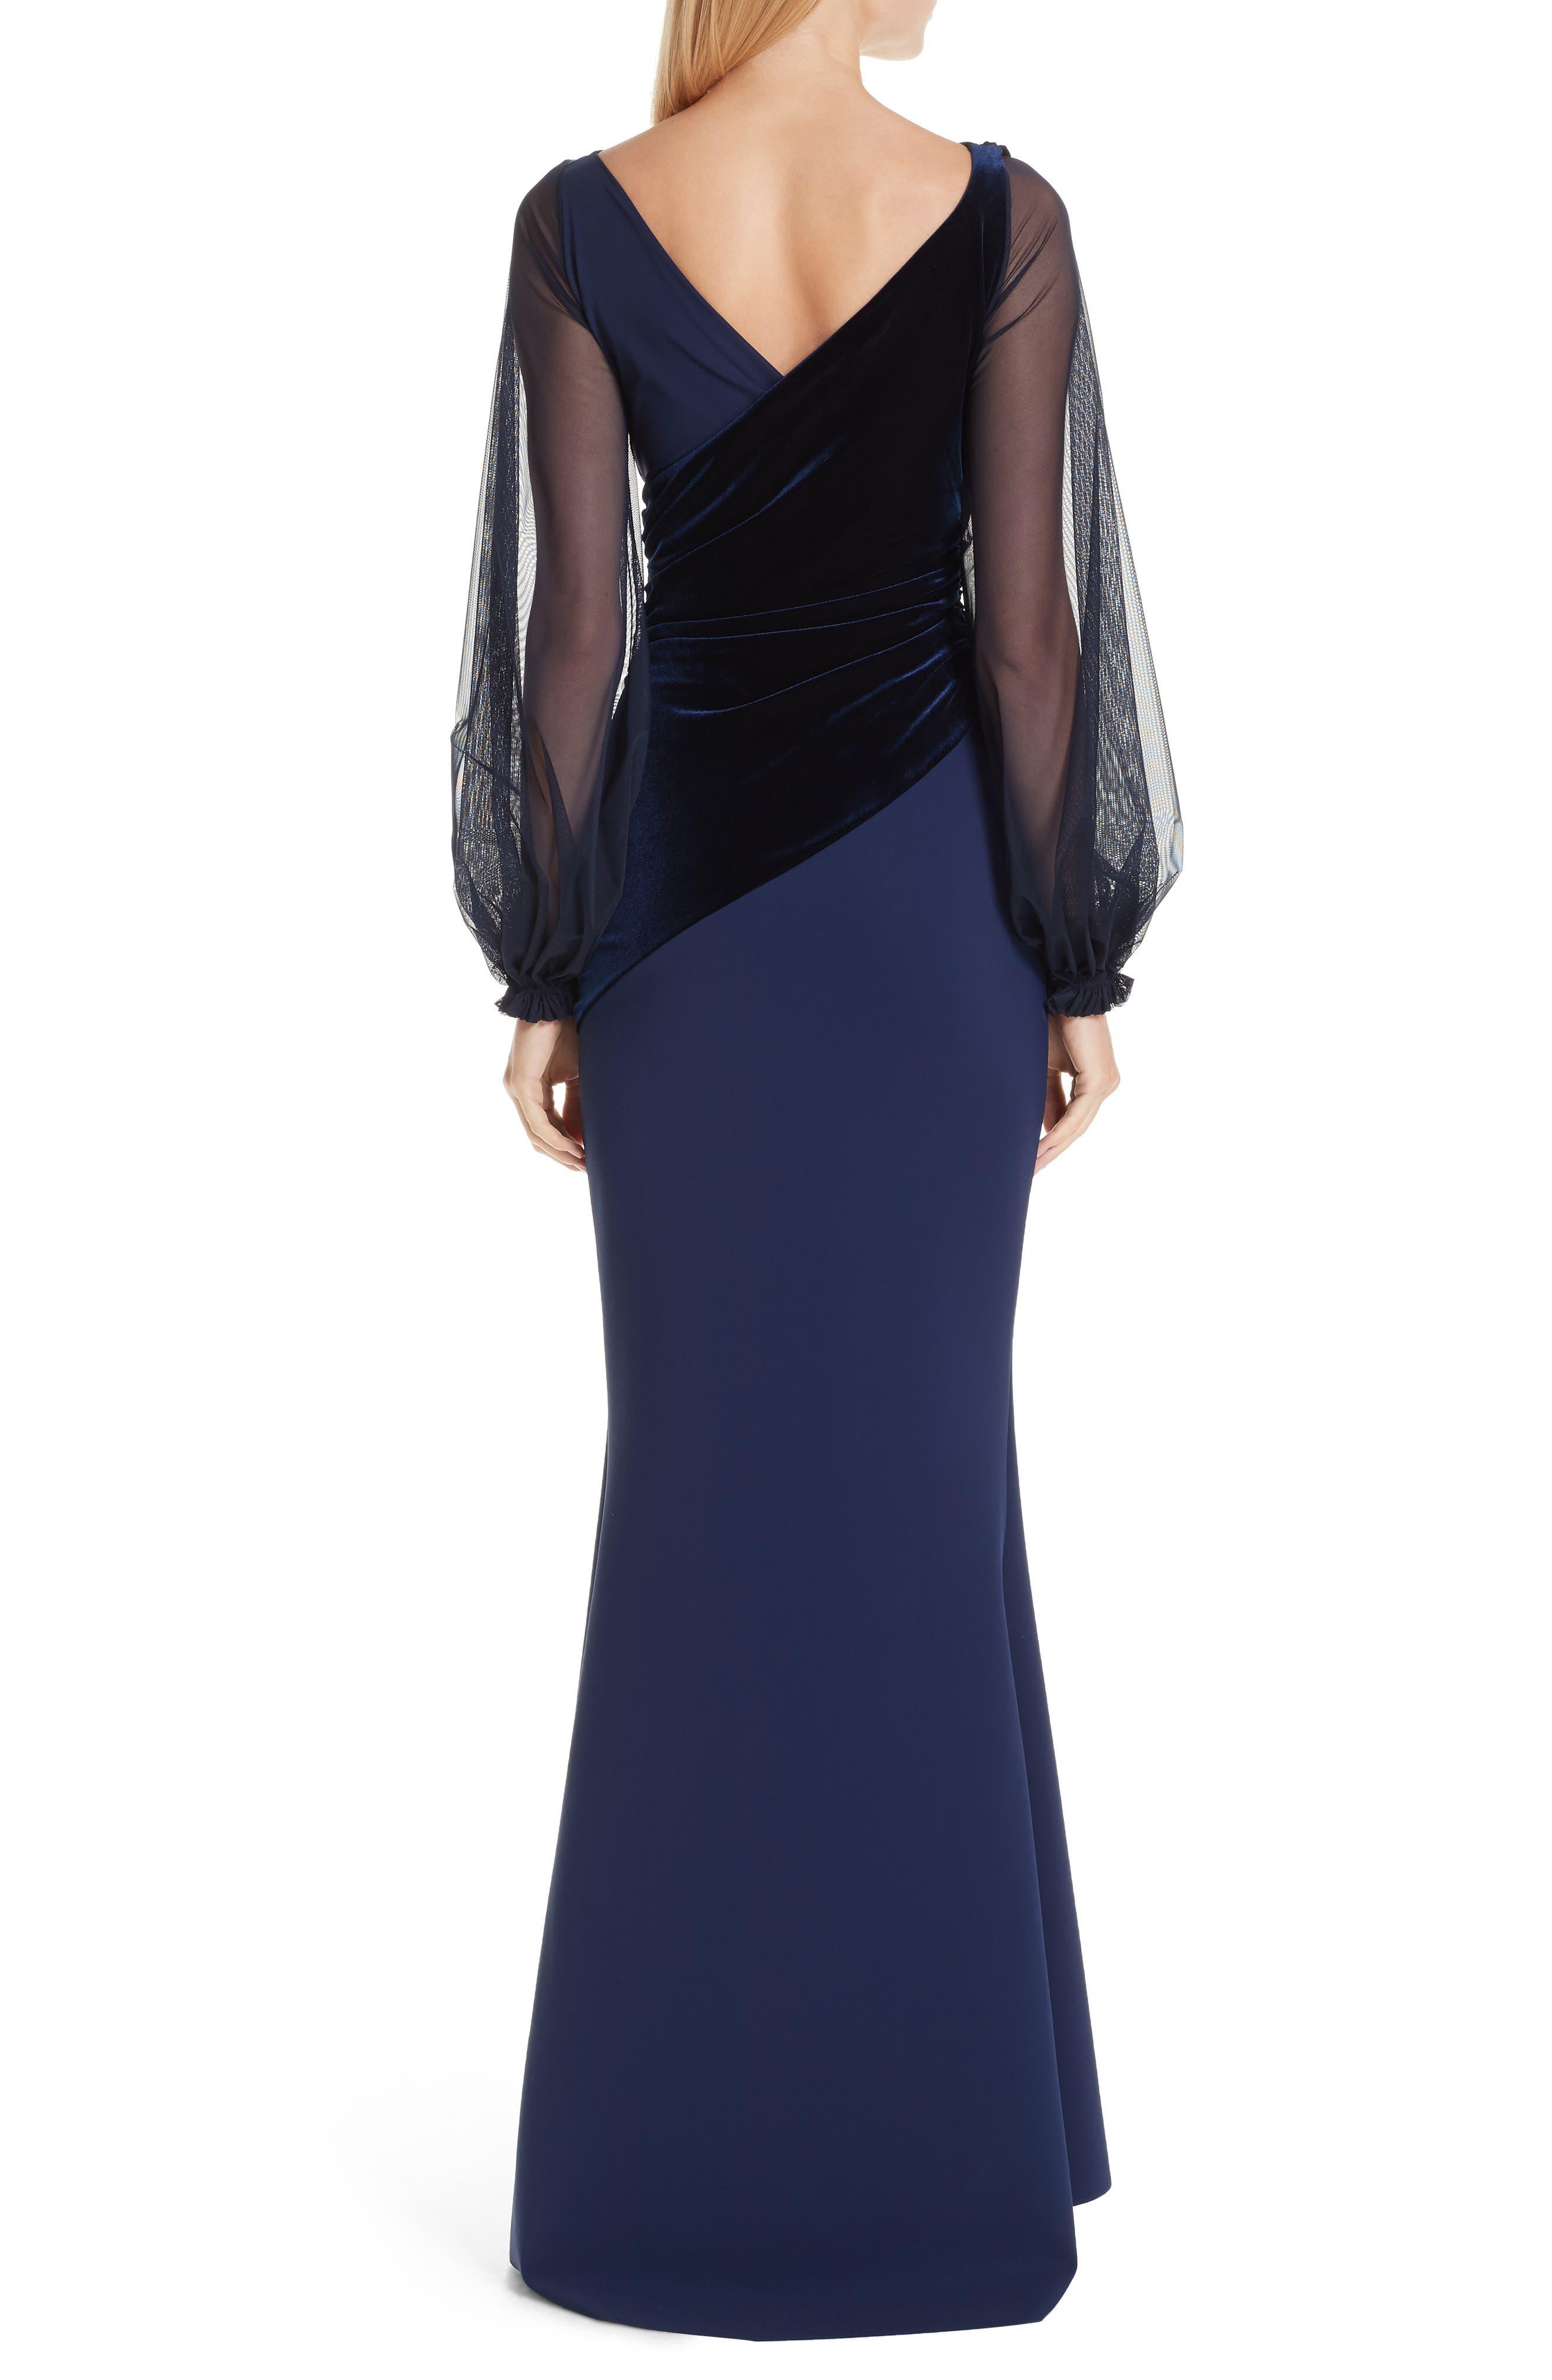 Erenira Mixed Media Gown,                             Alternate thumbnail 2, color,                             BLUE NOTTE